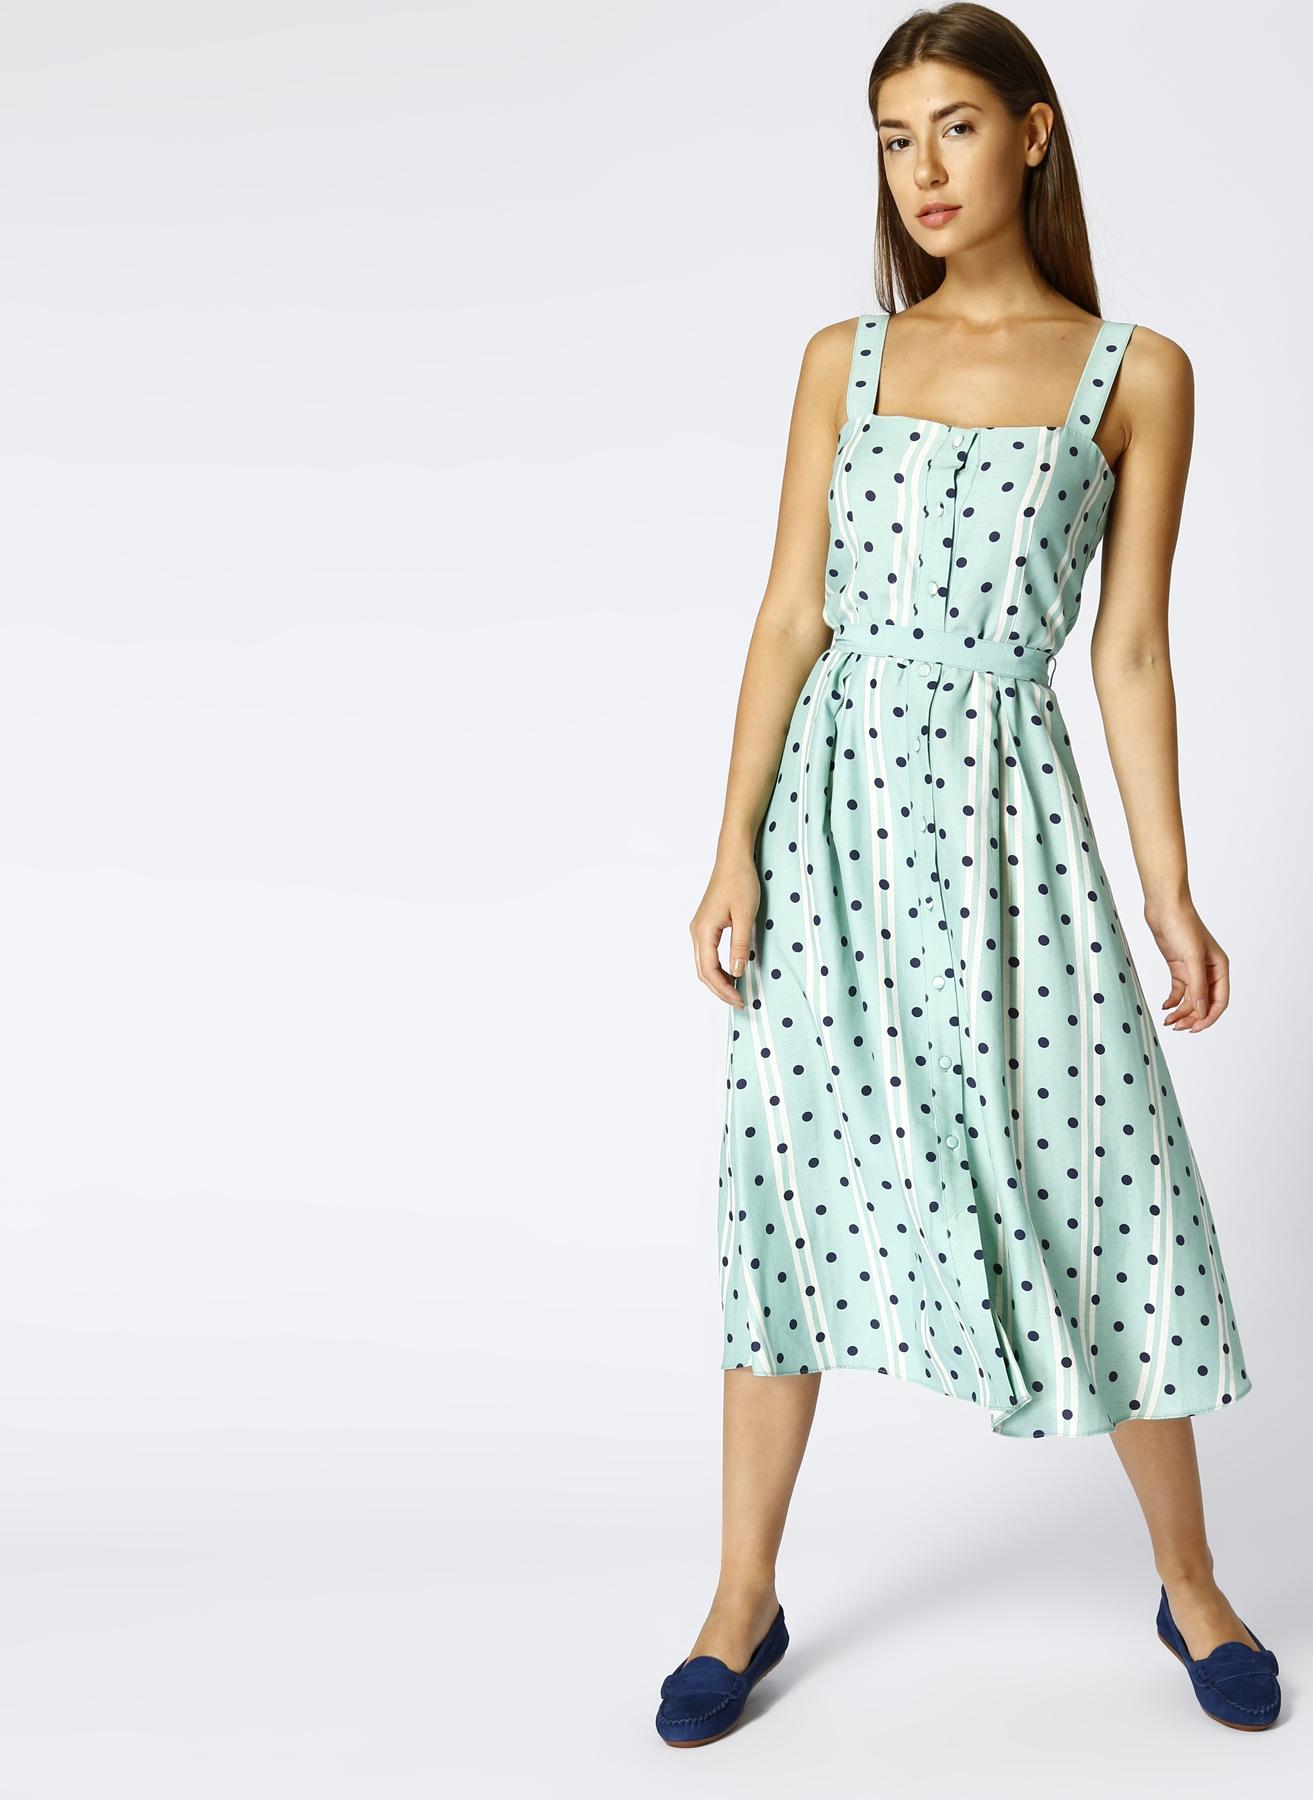 Random Puantiyeli Keten Mint Elbise 42 5000429351005